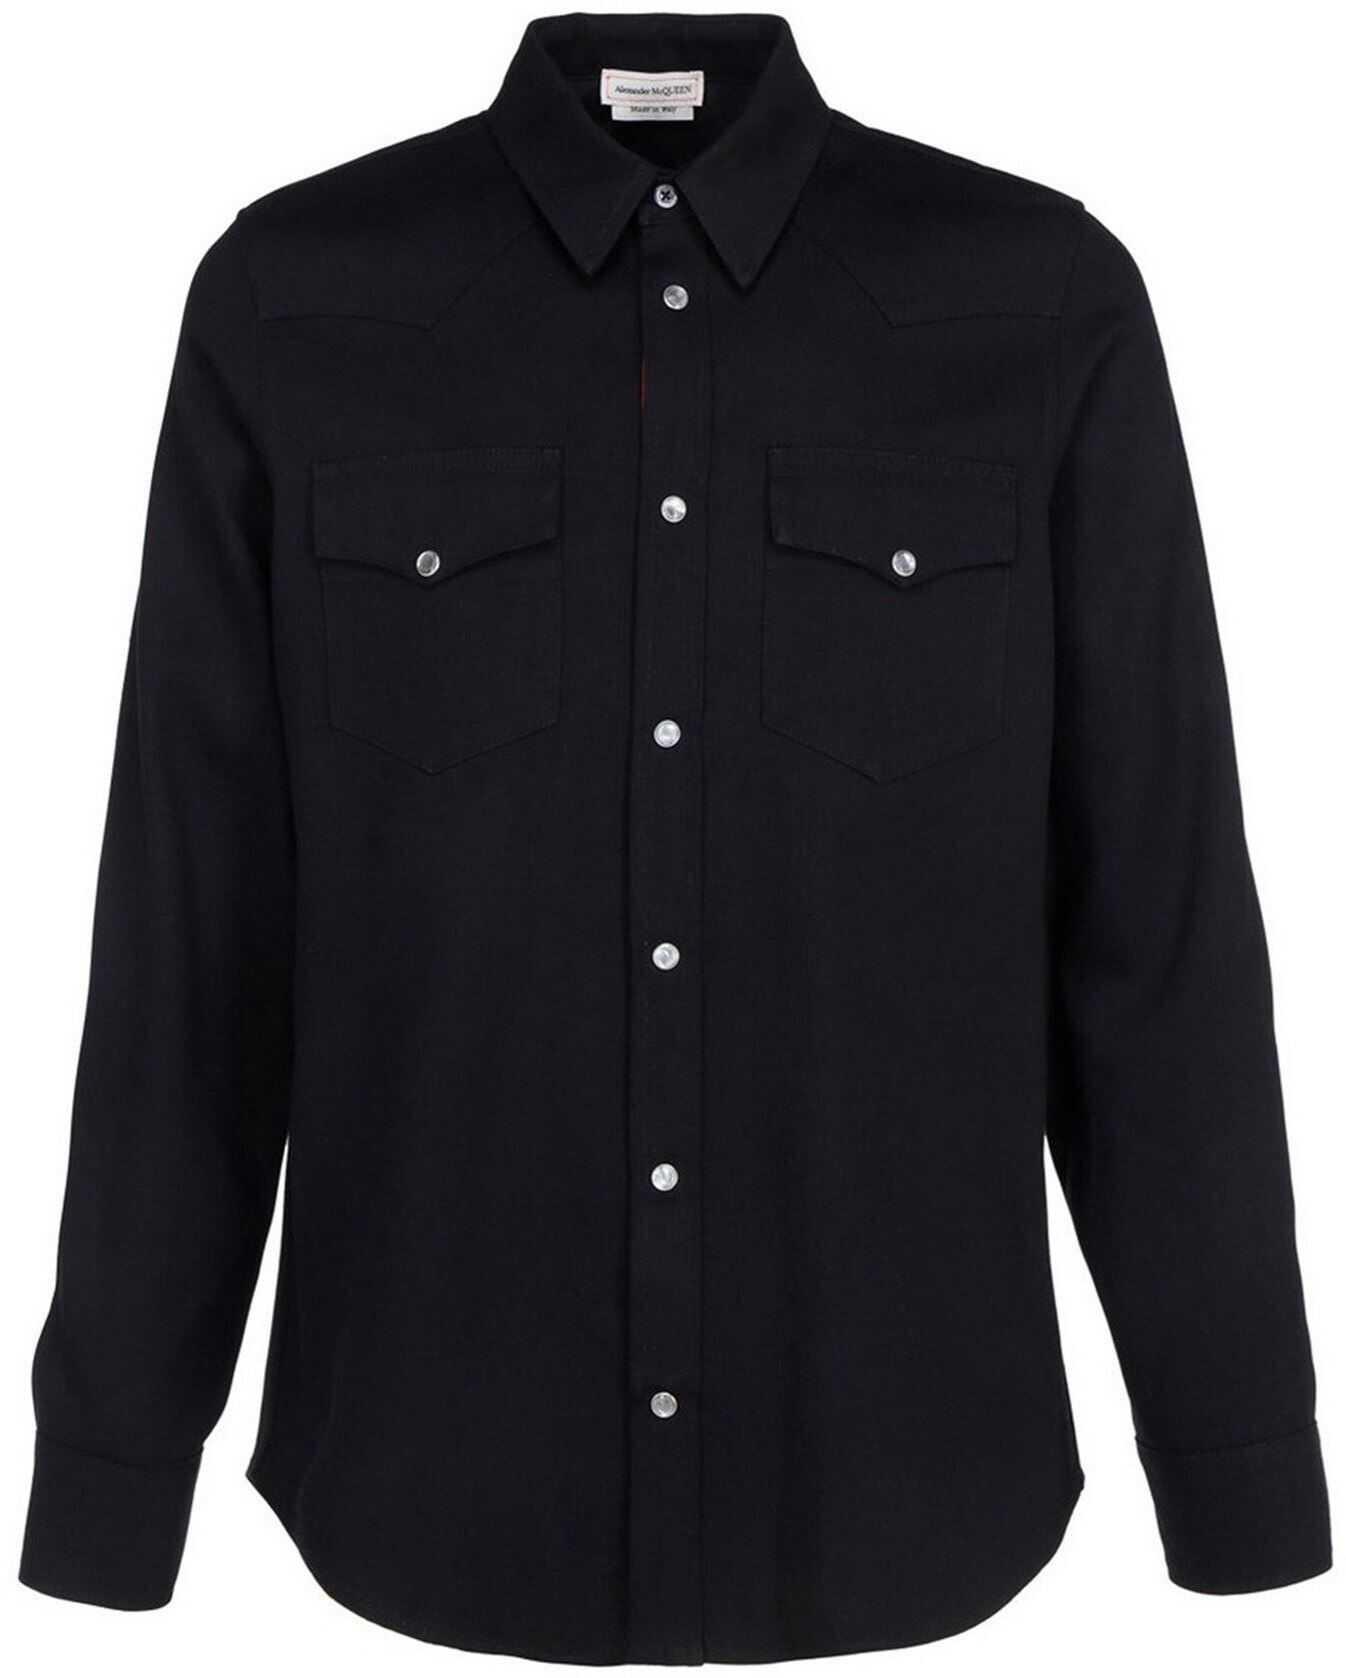 Alexander McQueen Breast Pocket Shirt In Black Black imagine